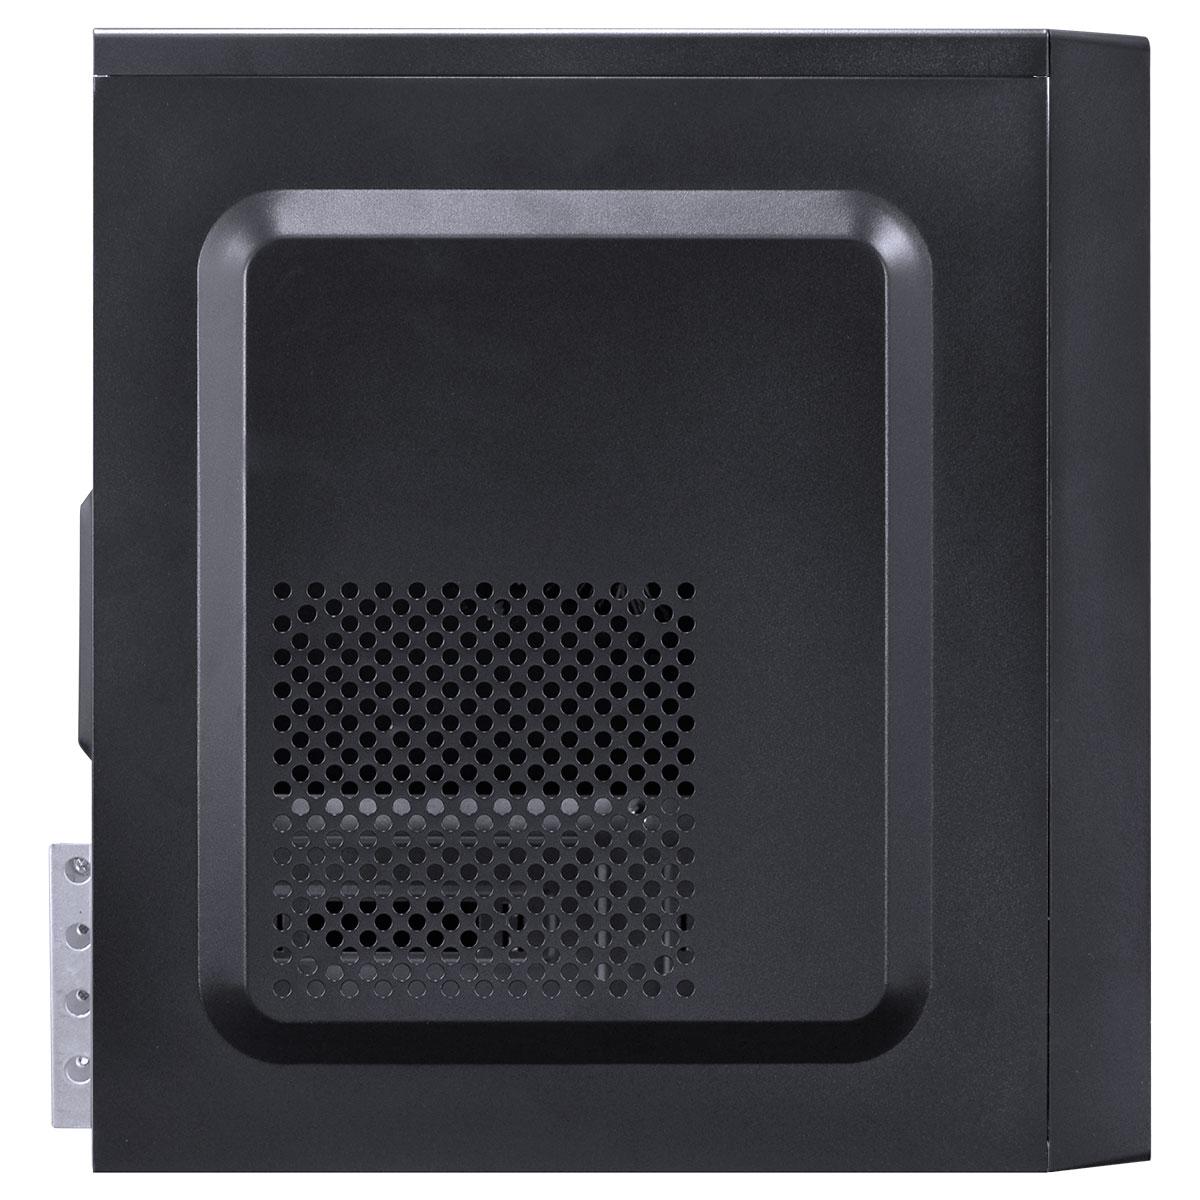 COMPUTADOR HOME H100 - CELERON DUAL CORE J1800 2.41GHZ MEM 4GB DDR3 SODIMM SEM HD/SSD HDMI/VGA FONTE 200W